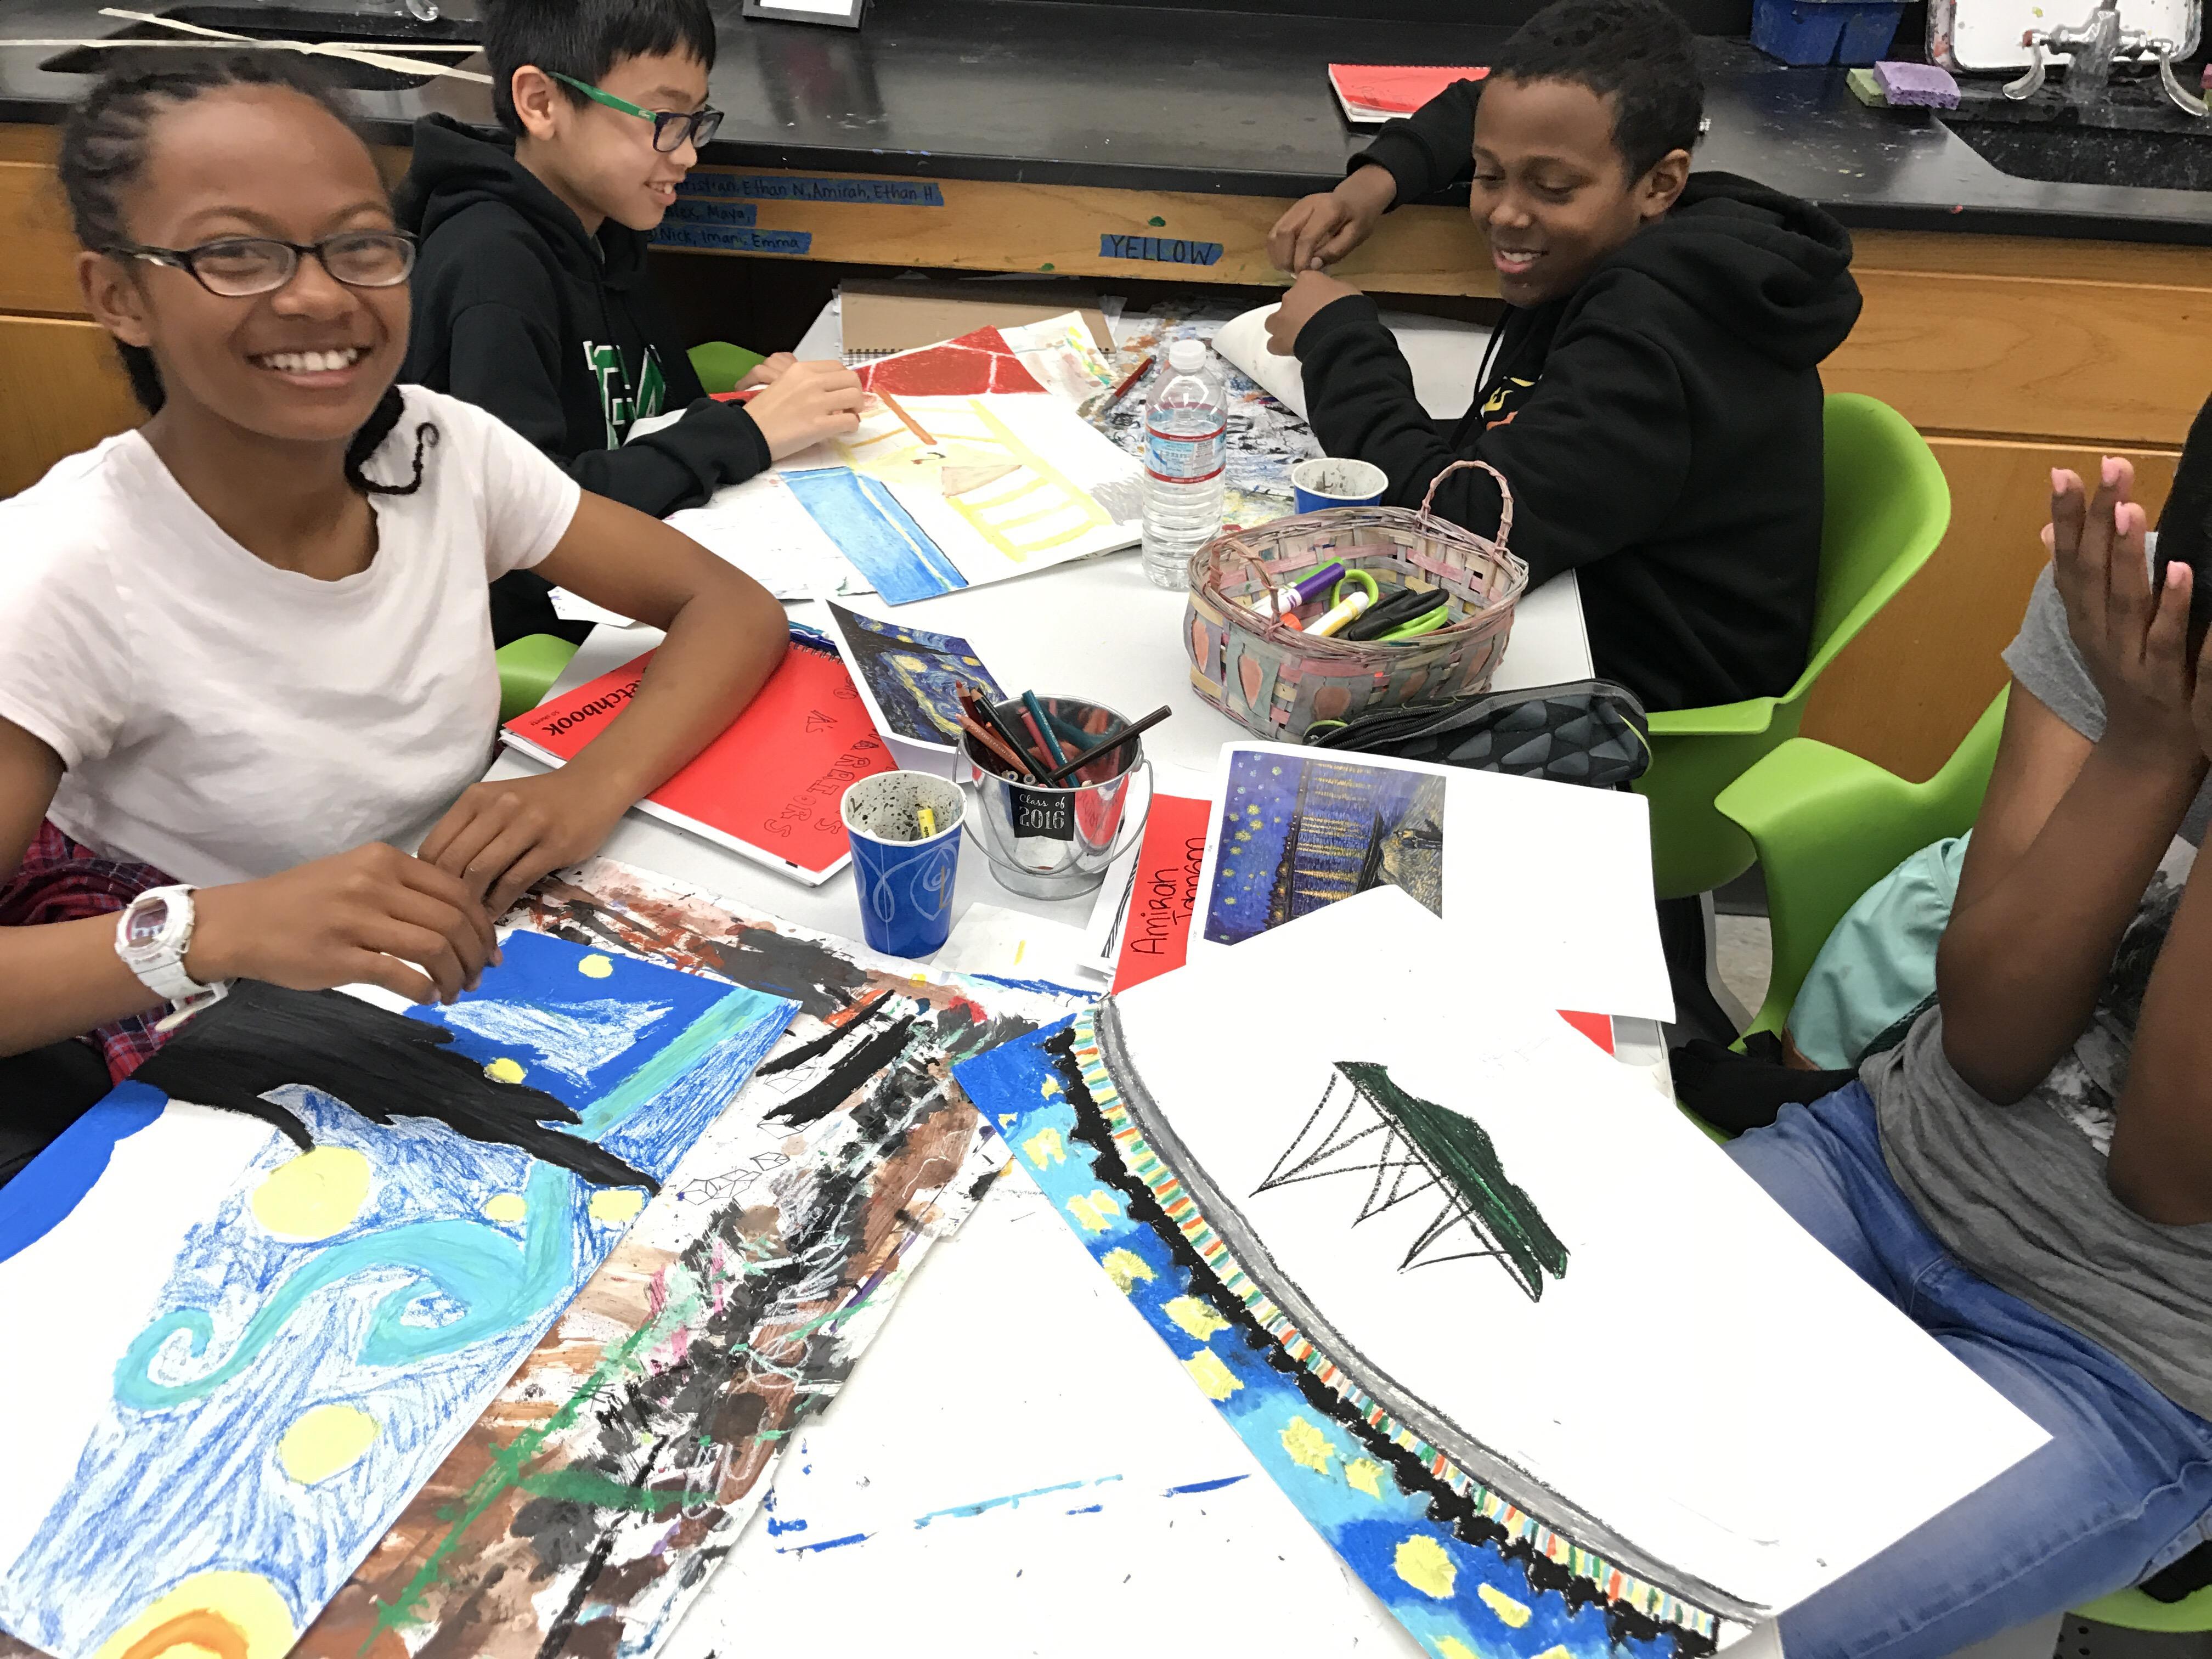 Van Gogh Oil Pastel – Middle School Arts Pathway